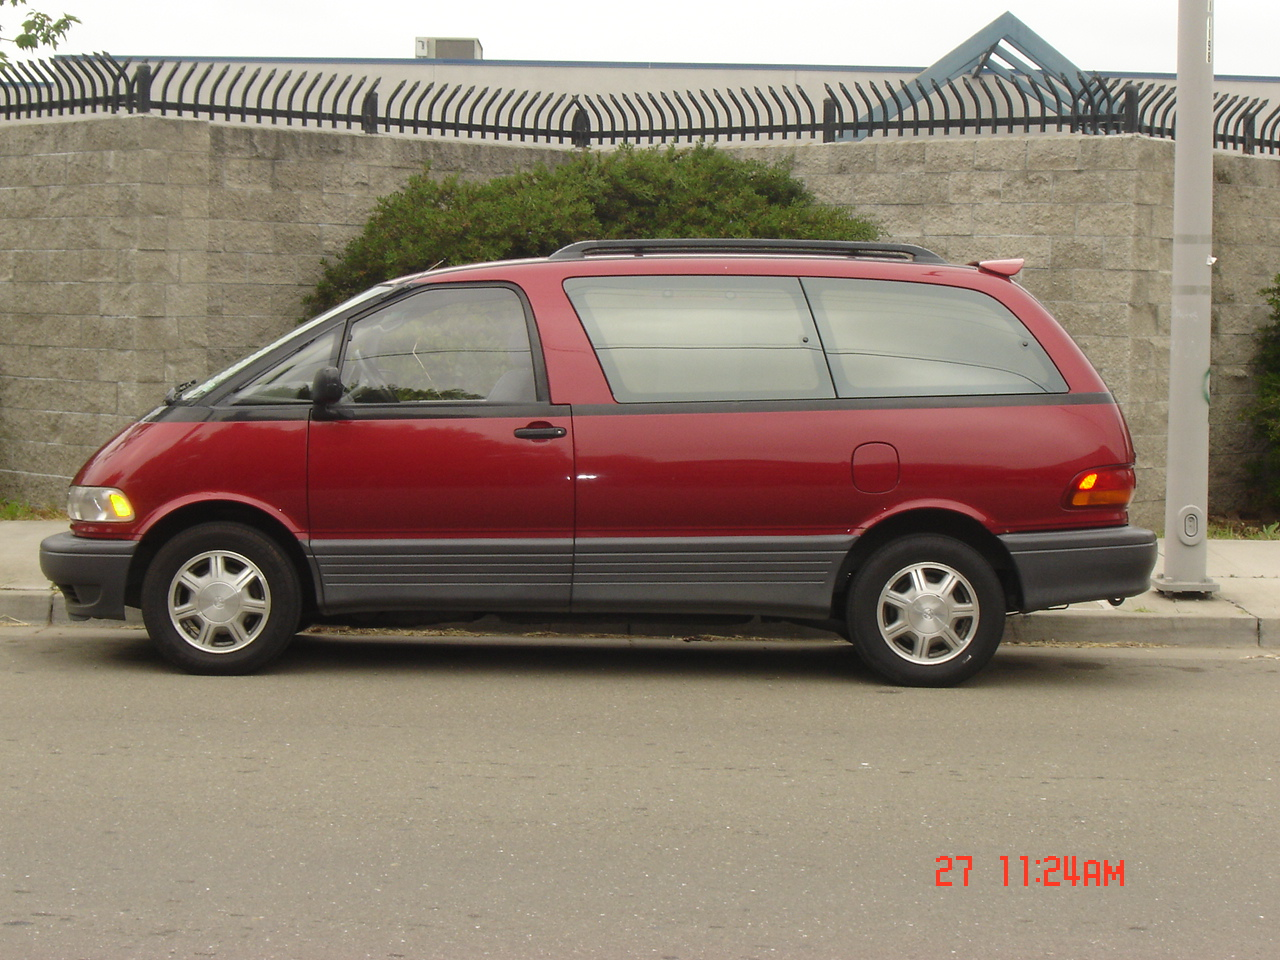 Picture of 1994 toyota previa 3 dr le passenger van